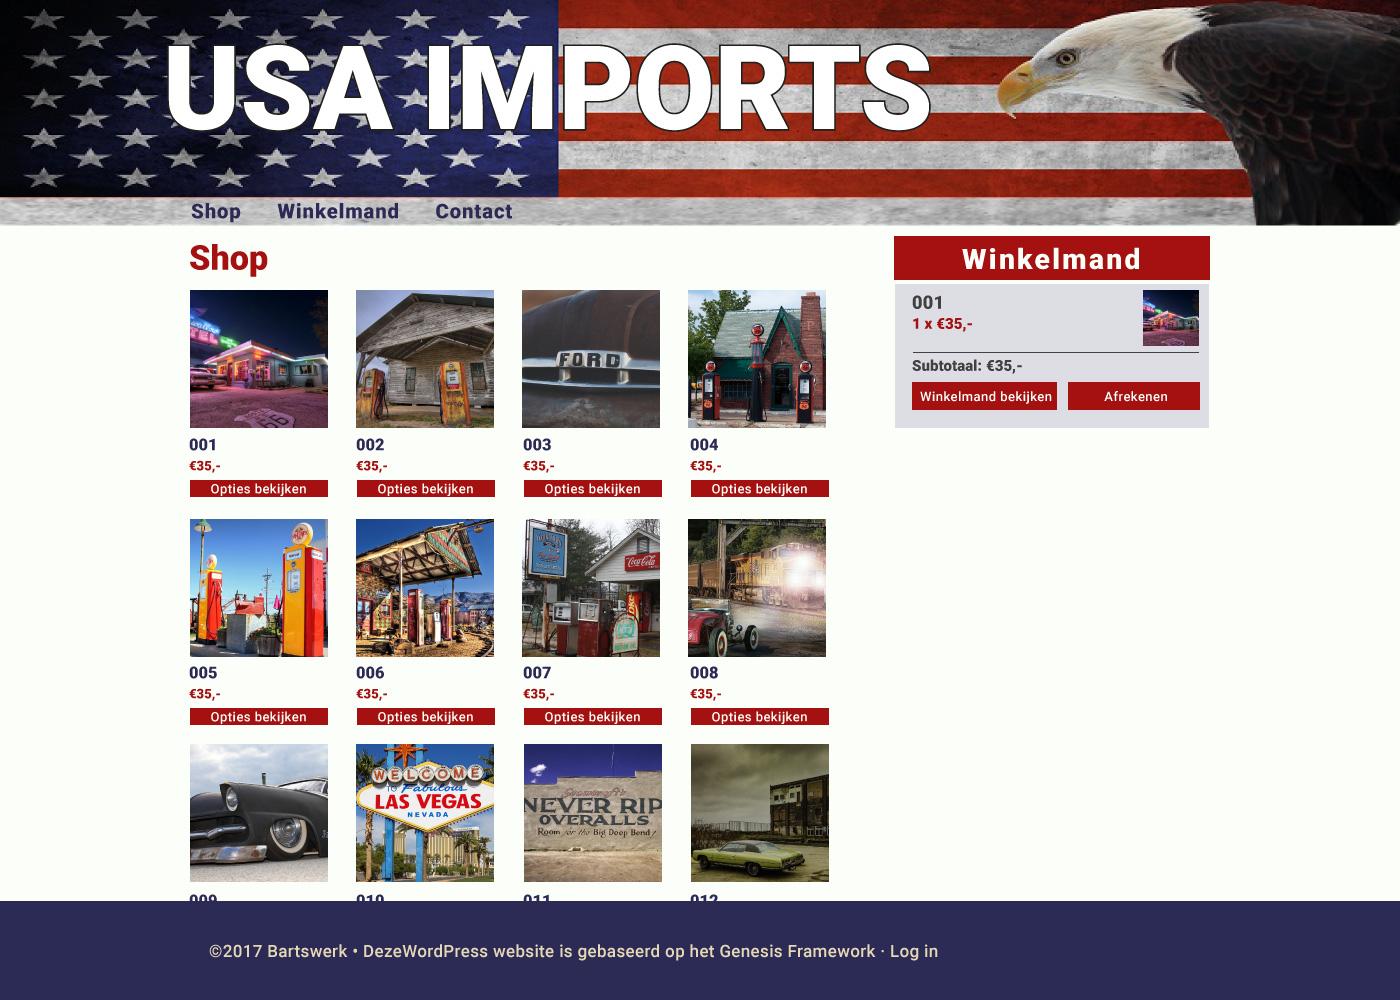 USA-imports website